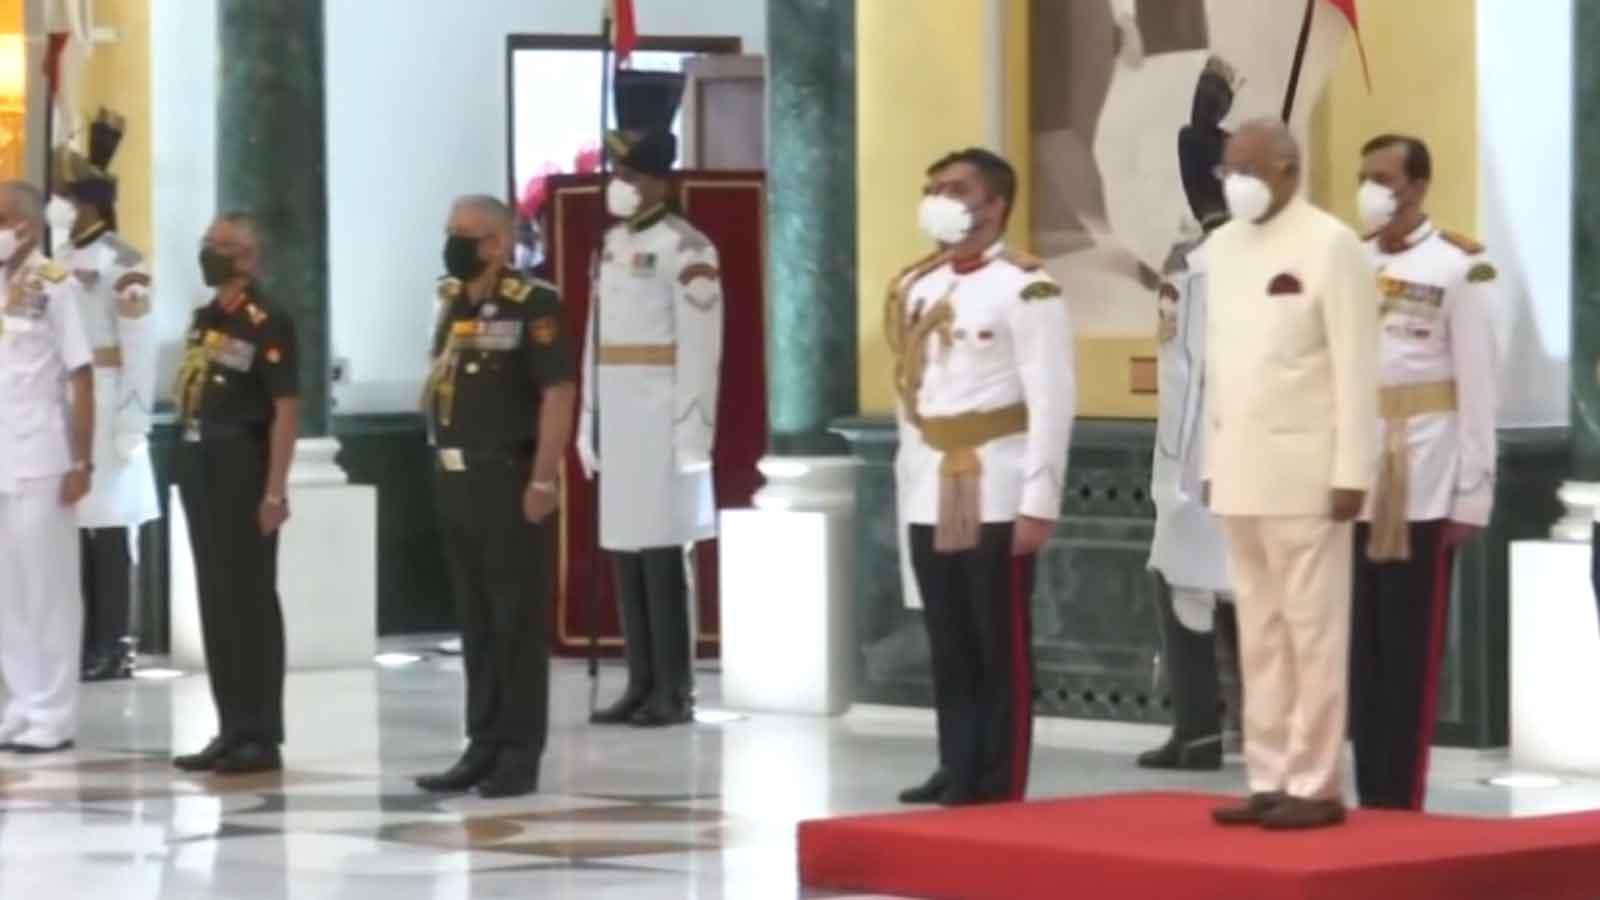 president-ram-nath-kovind-hosts-at-home-reception-on-i-day-pm-modi-army-chief-present